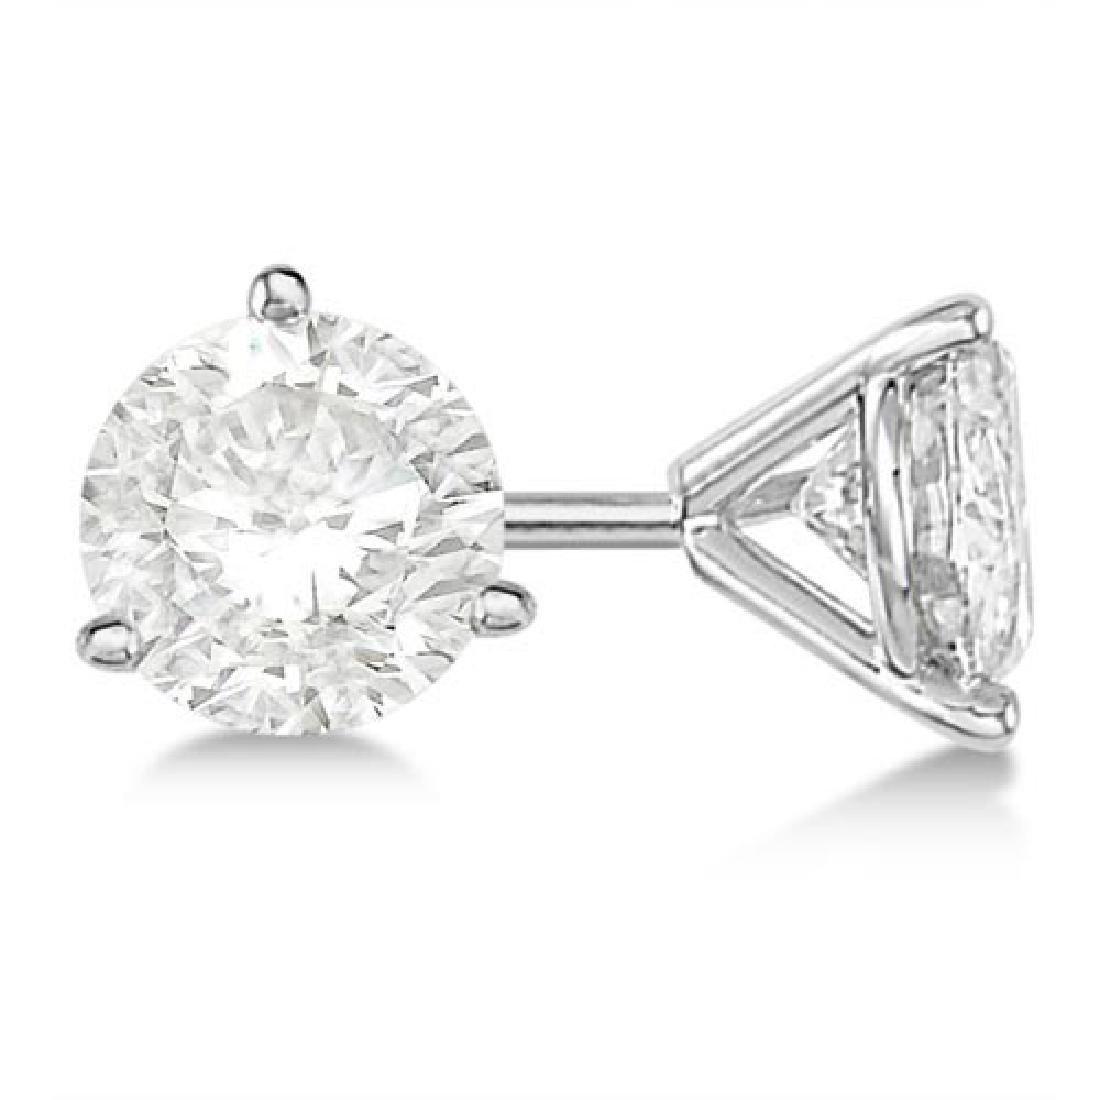 1.00ct. 3-Prong Martini Diamond Stud Earrings 14kt Whit